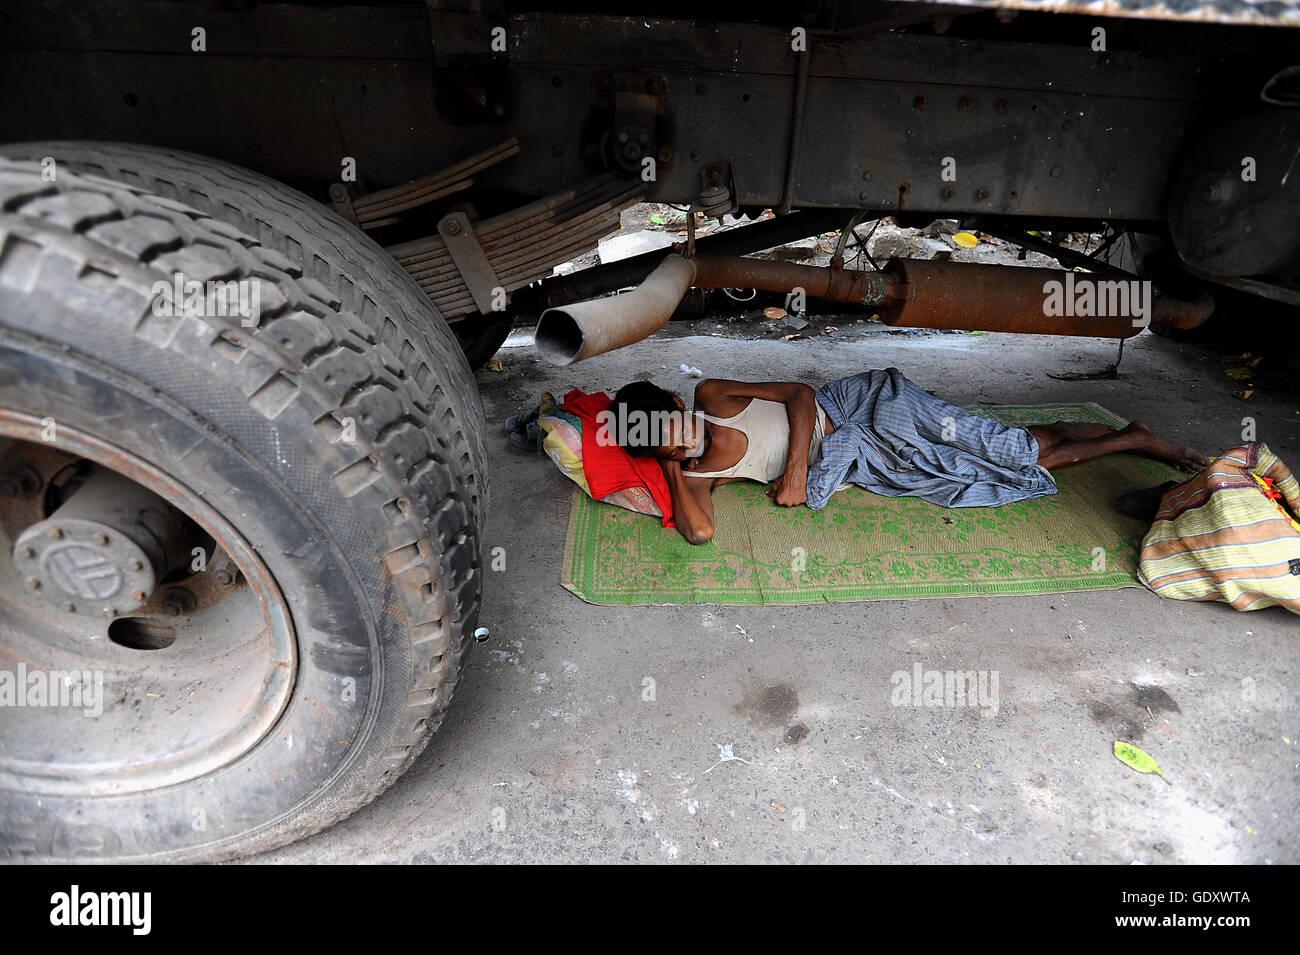 A Man Sleeps Under A Truck In Kolkata Stock Photos